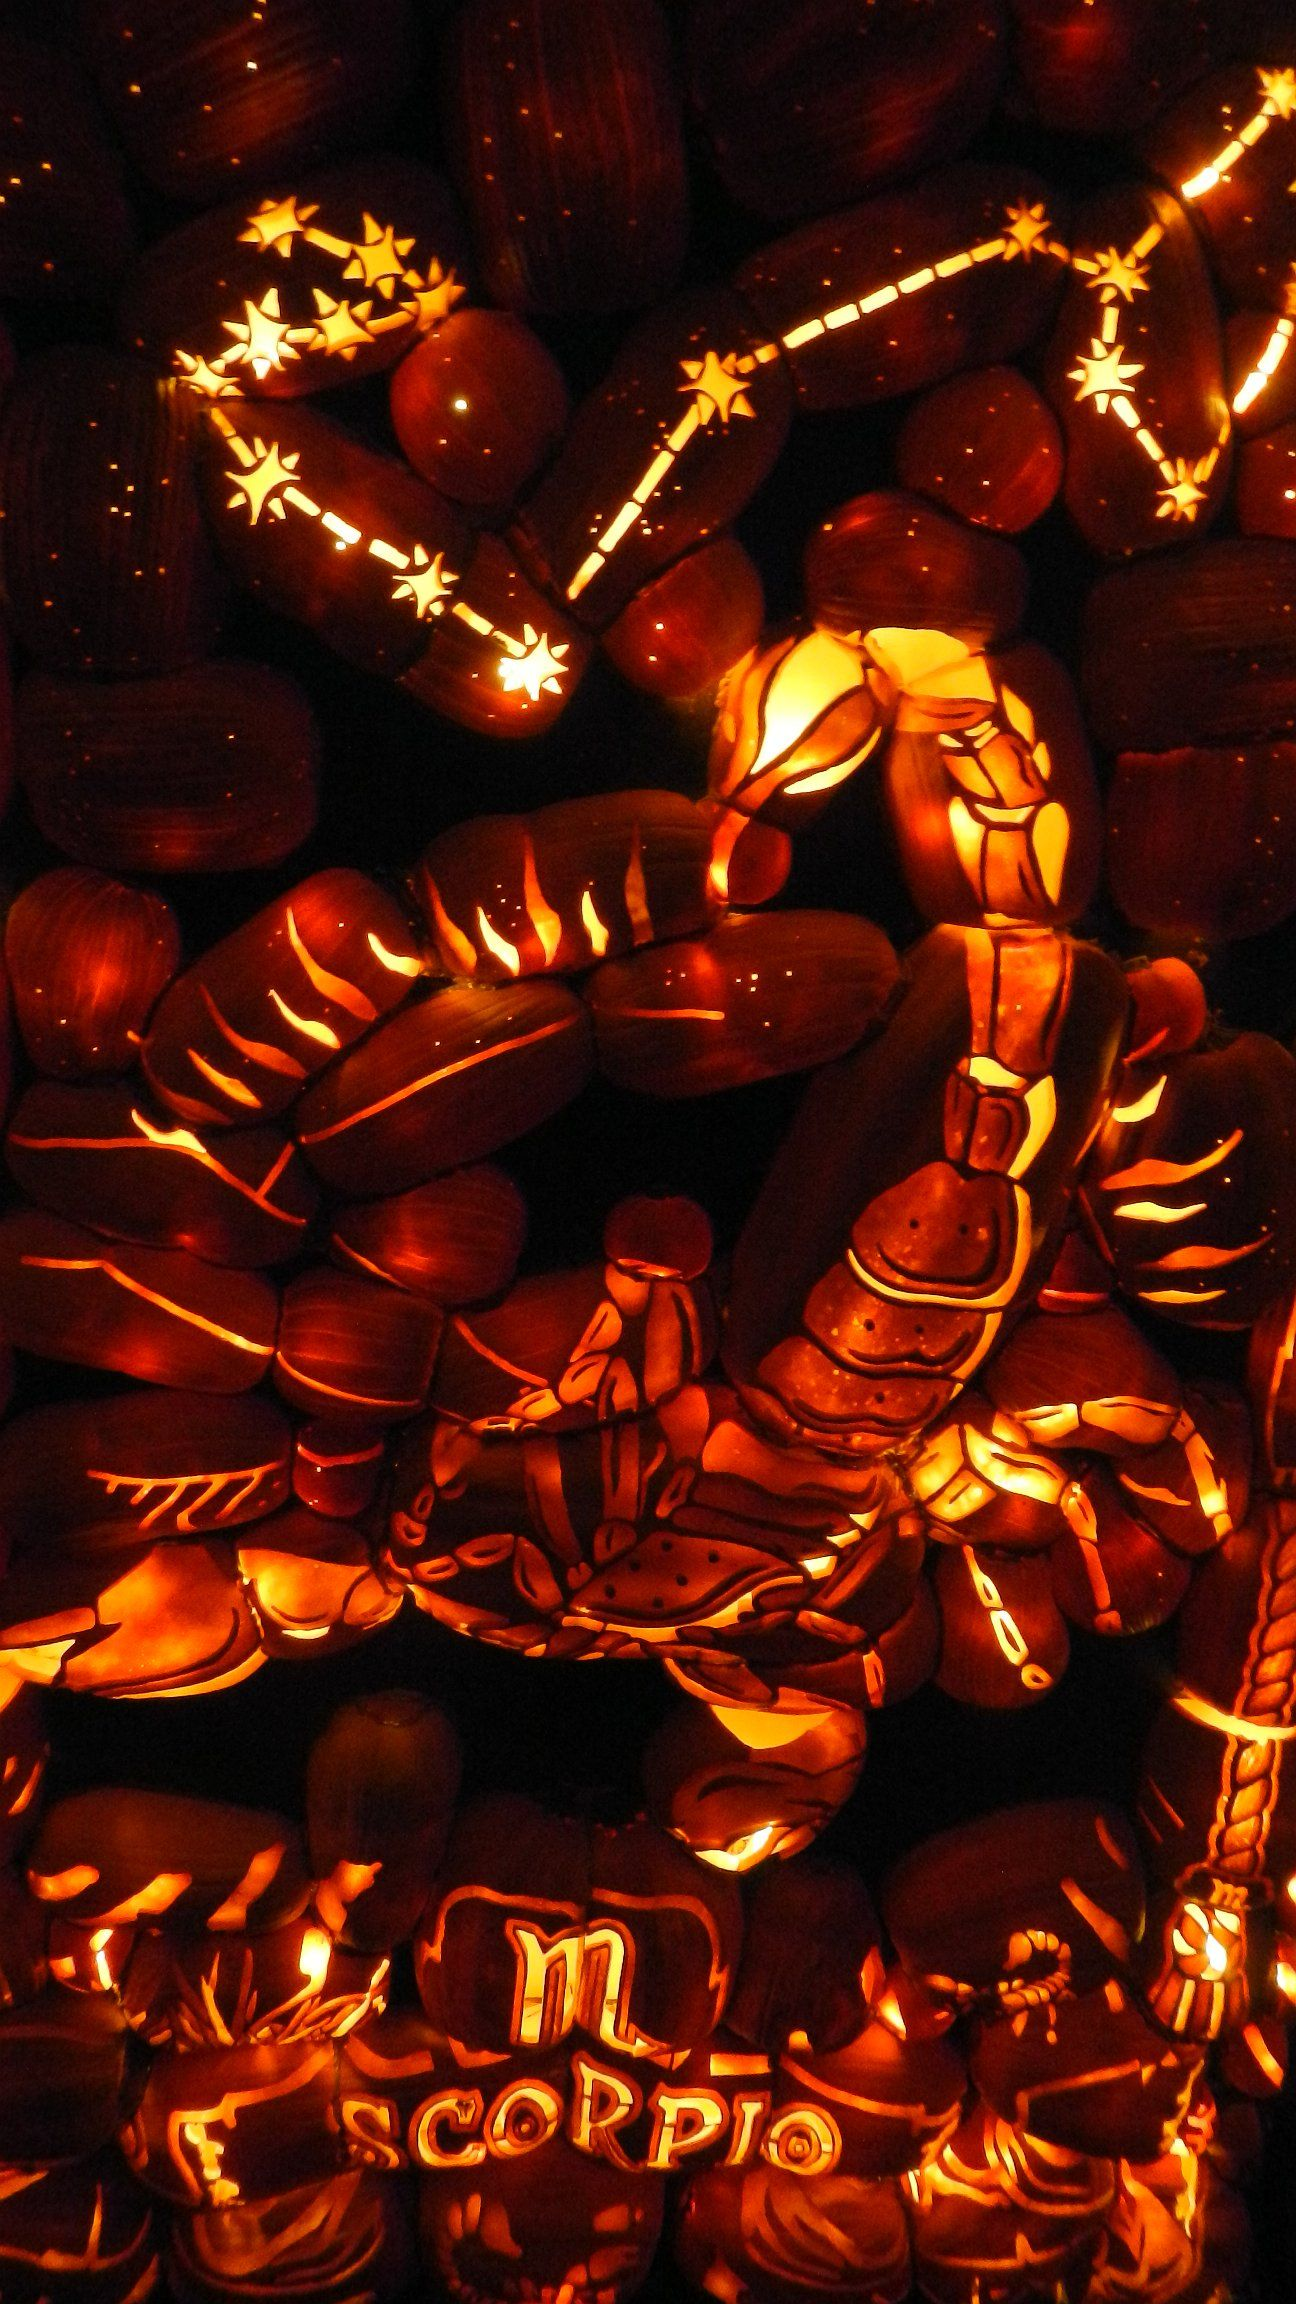 Pumpkinferno Upper Canada Village Horoscopes Scorpio